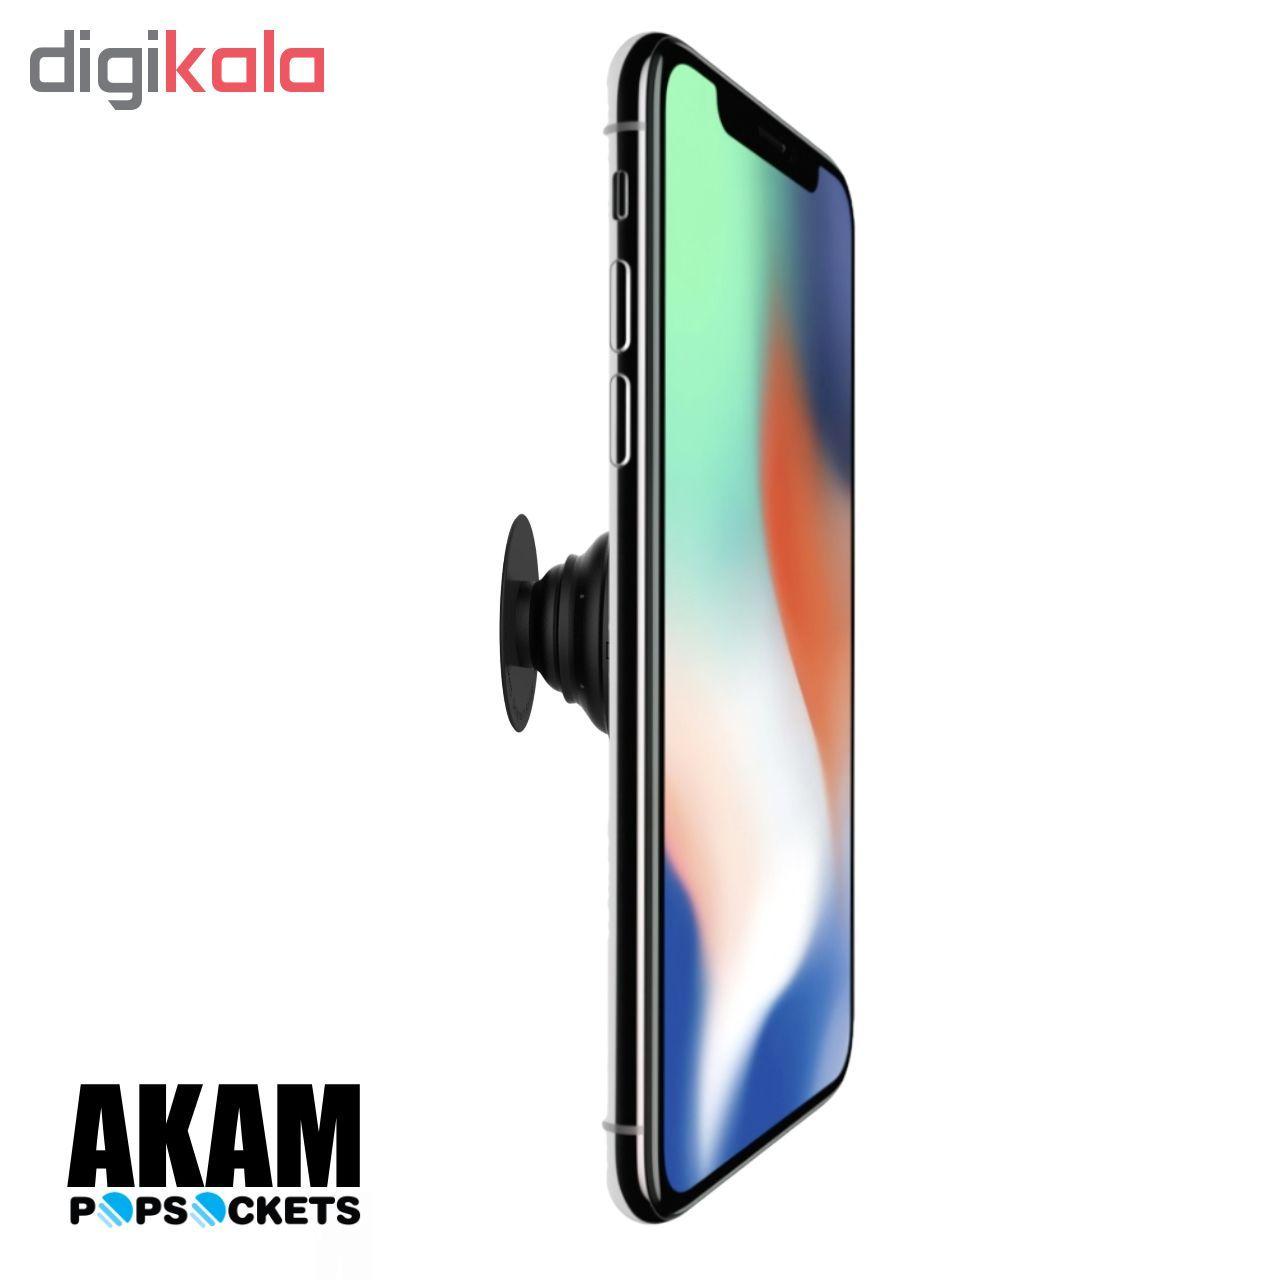 پایه نگهدارنده گوشی موبایل پاپ سوکت آکام مدل APS0161 main 1 10